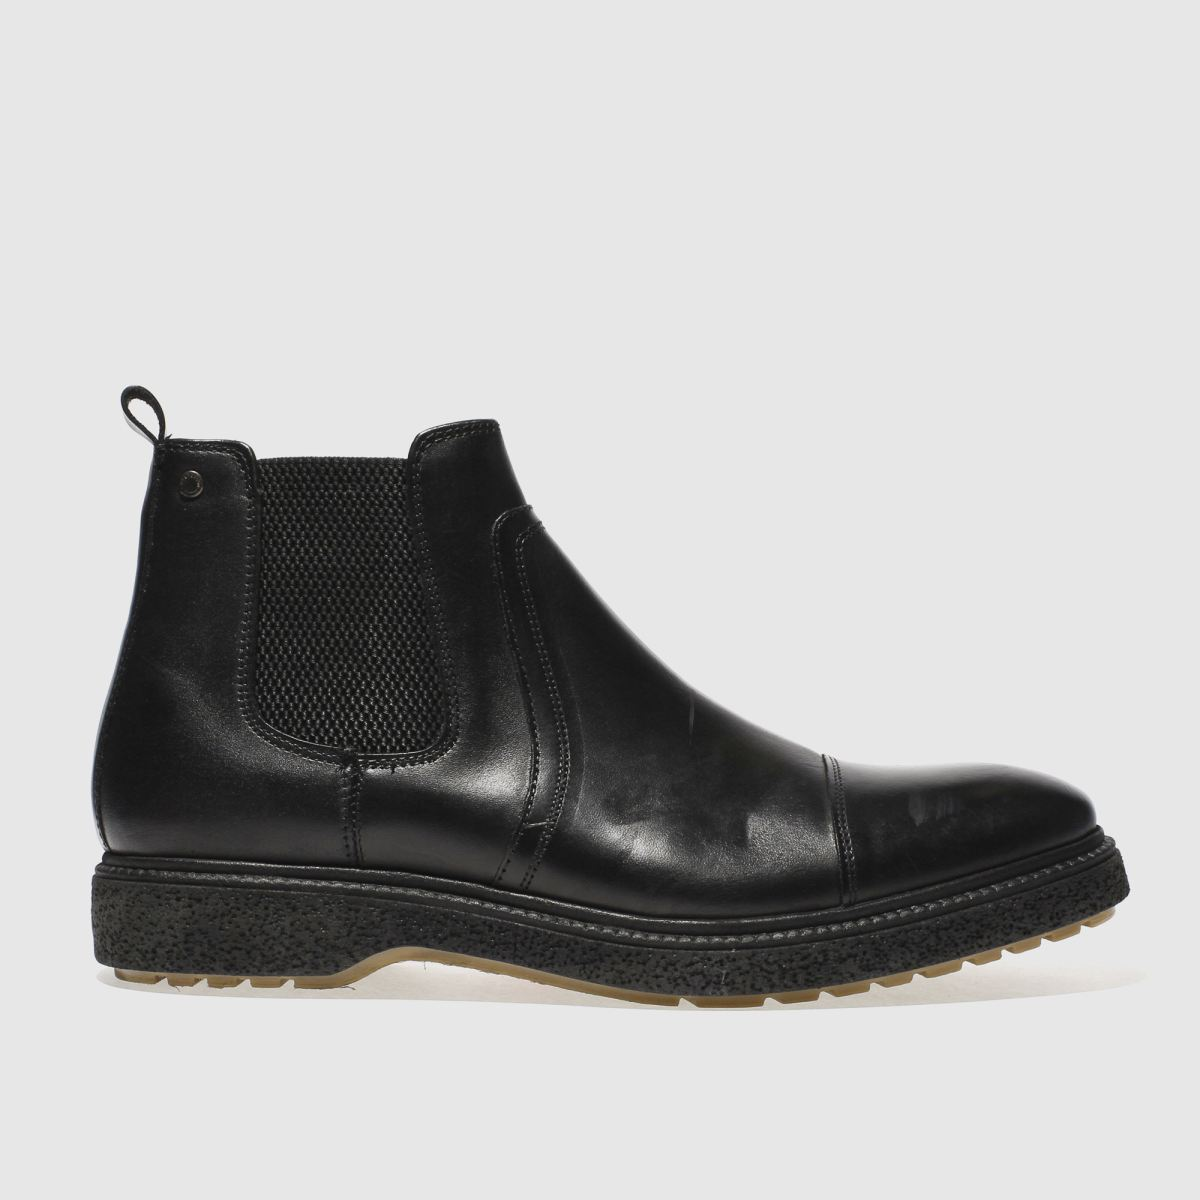 base london black zoot boots